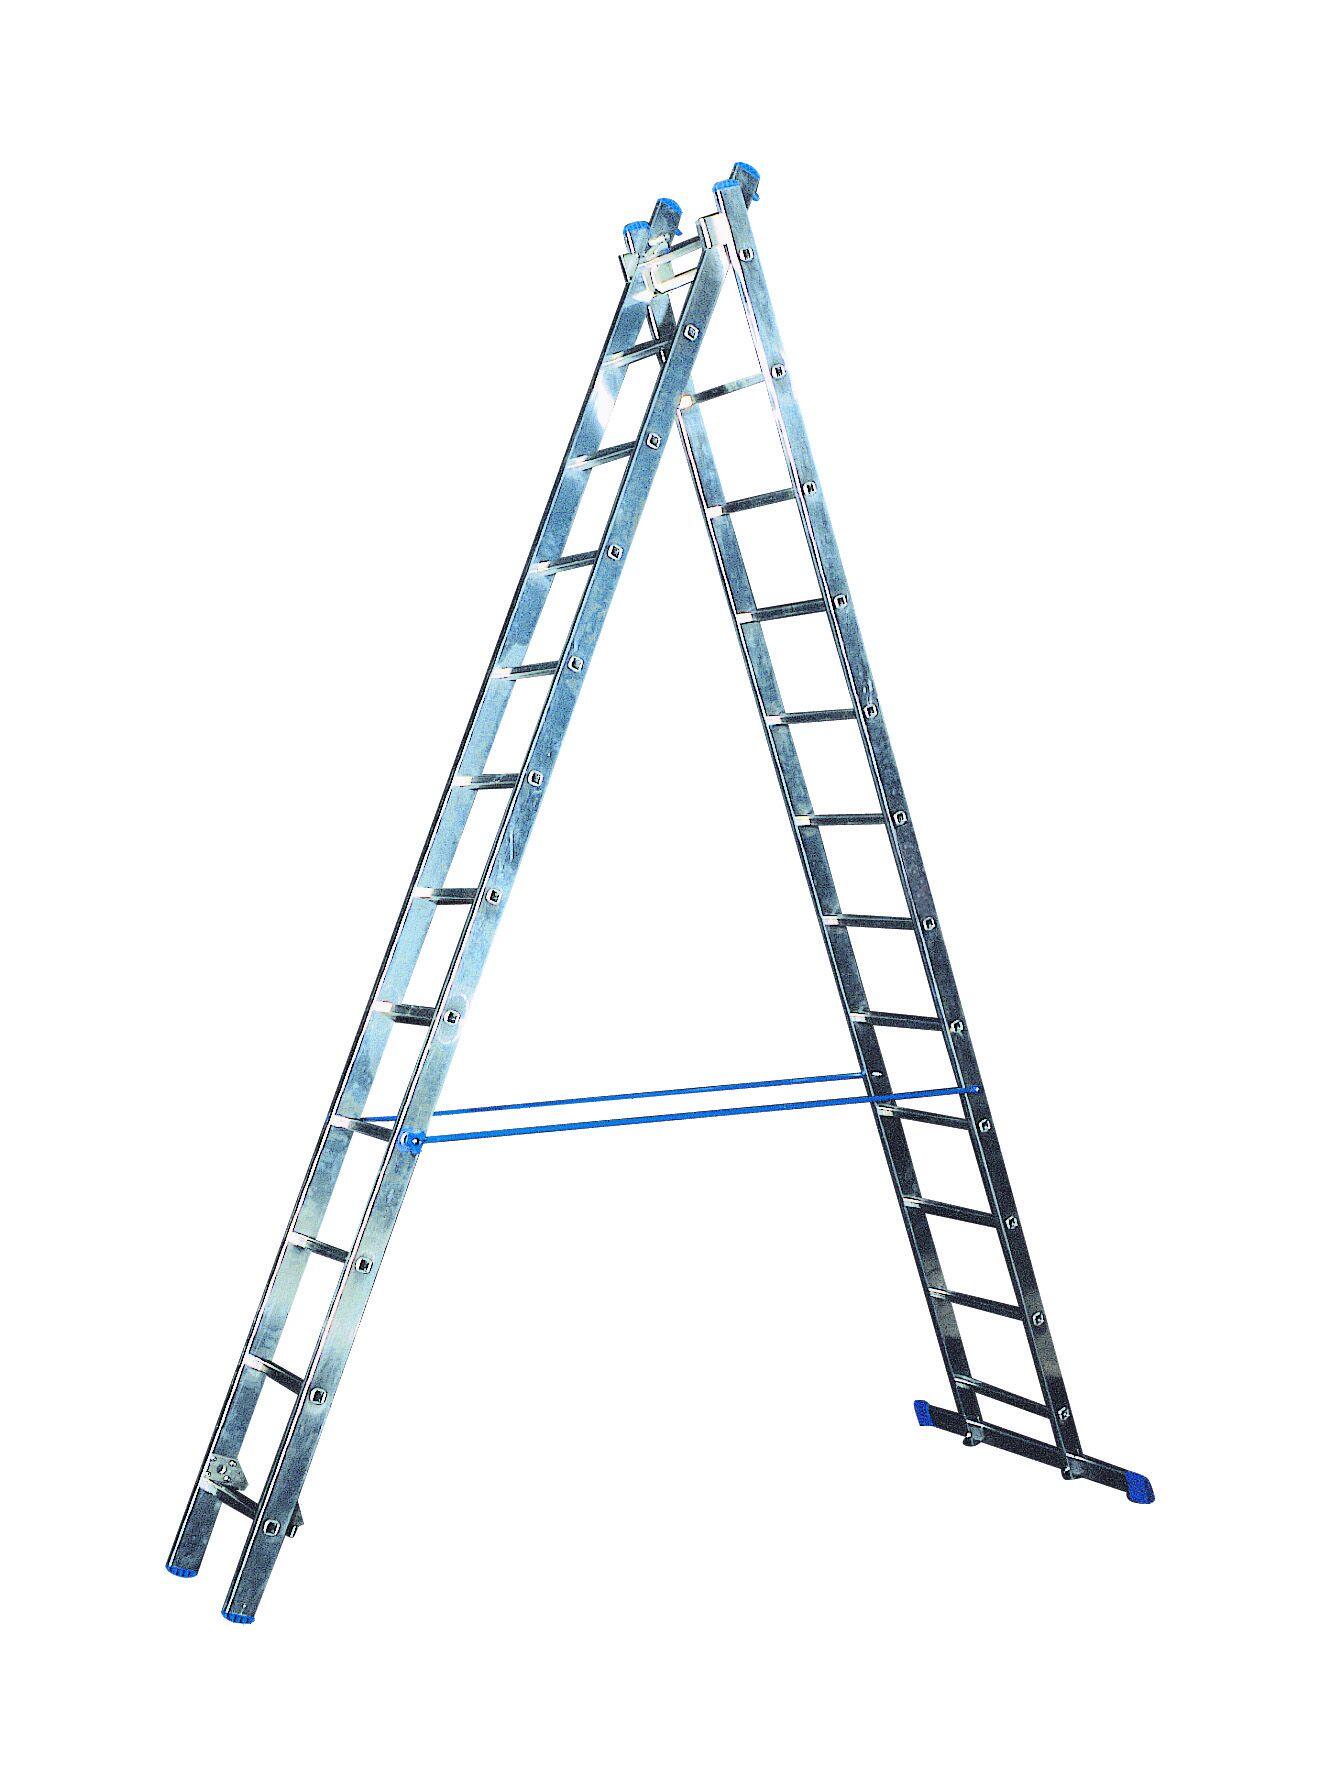 Žebřík hliníkový víceučelový HOBBY VHR H 2x8 Al